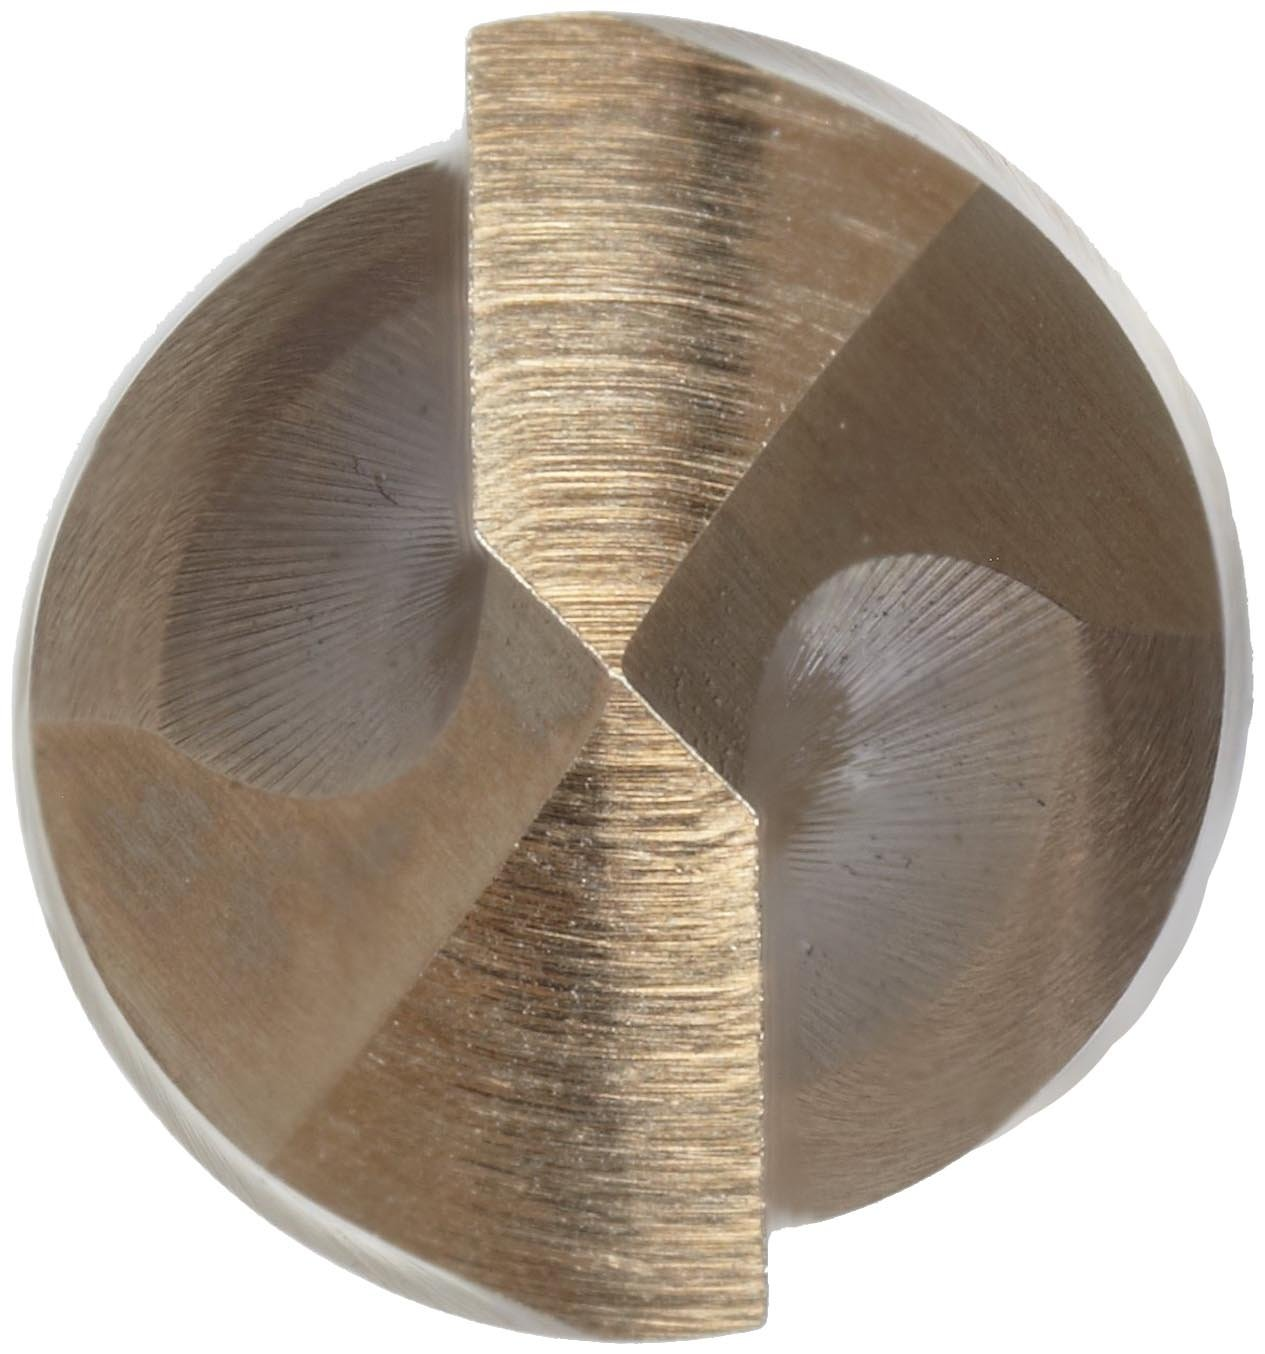 135 Degree Split Point 10.50mm Spiral Flute Round Shank Precision Twist 4ASMCO Cobalt Steel Short Length Drill Bit Bronze Oxide Finish Pack of 6